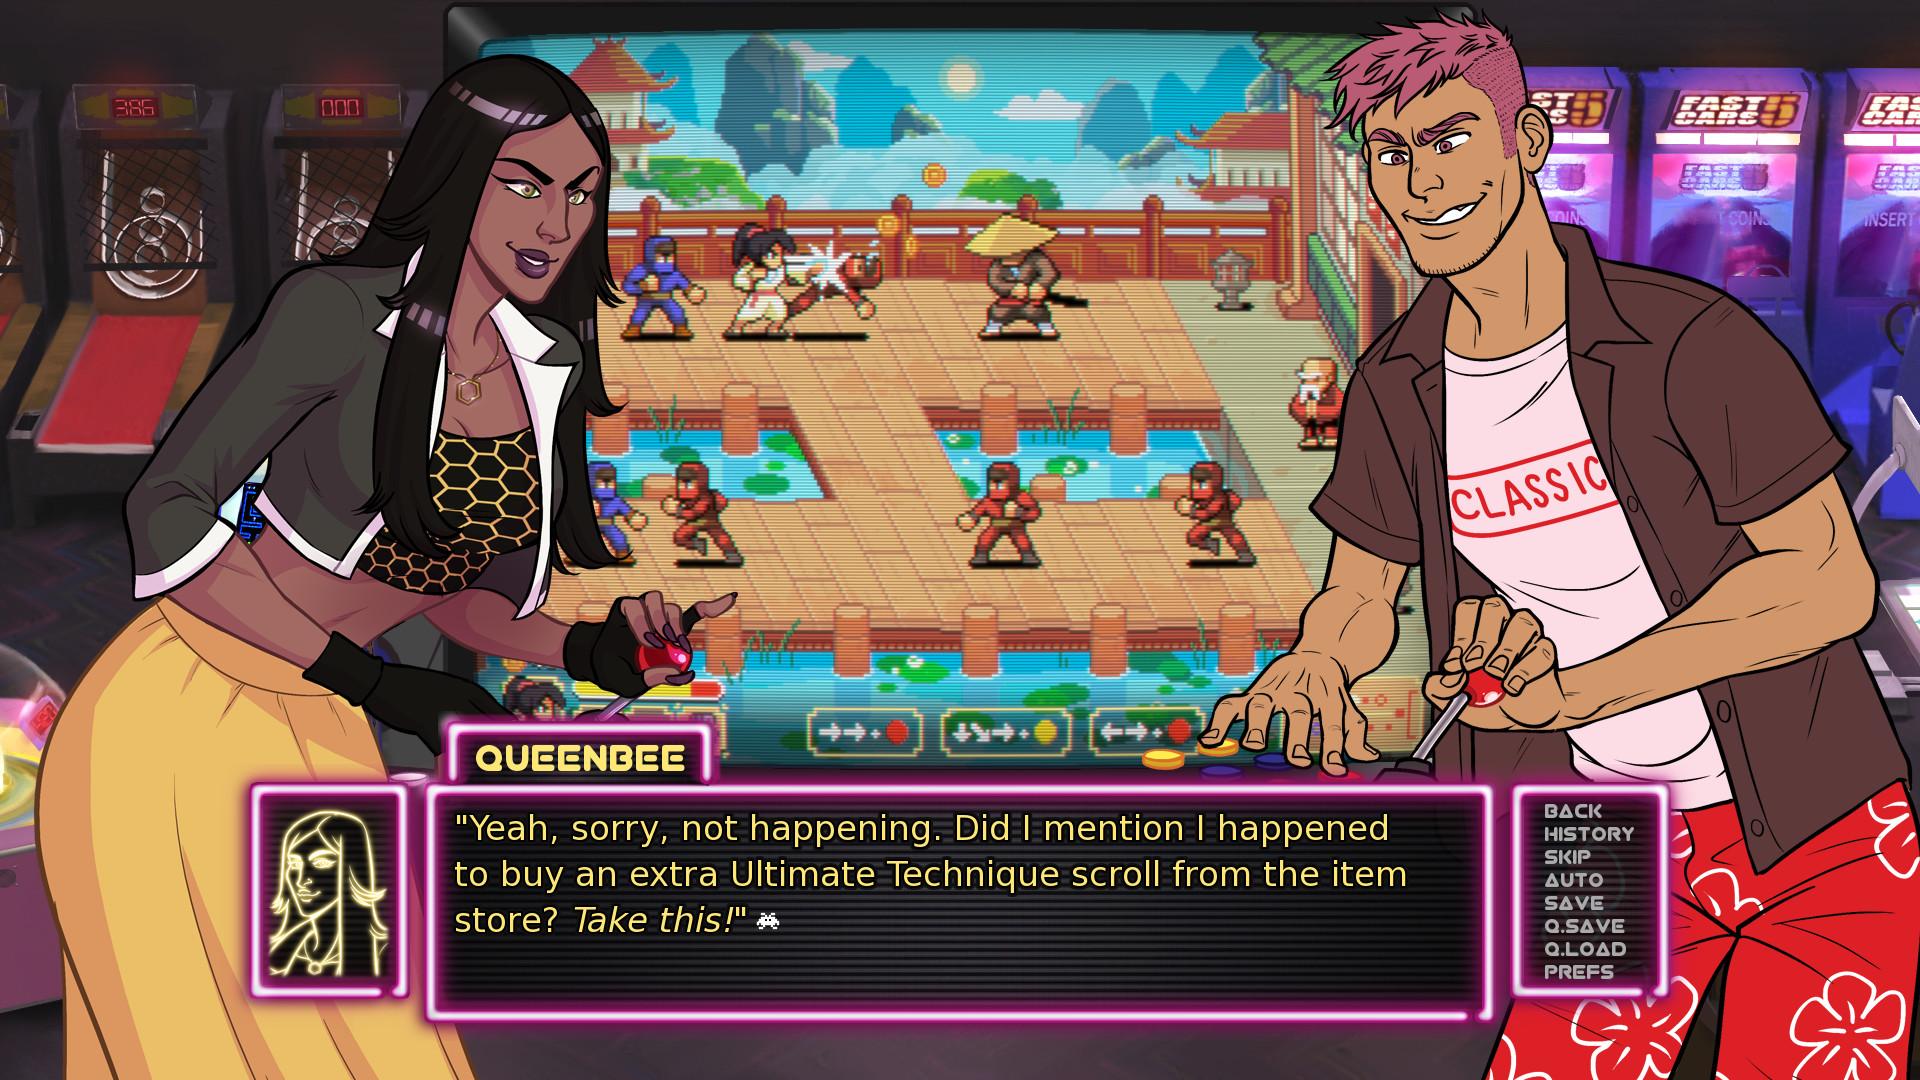 flirting games dating games play download